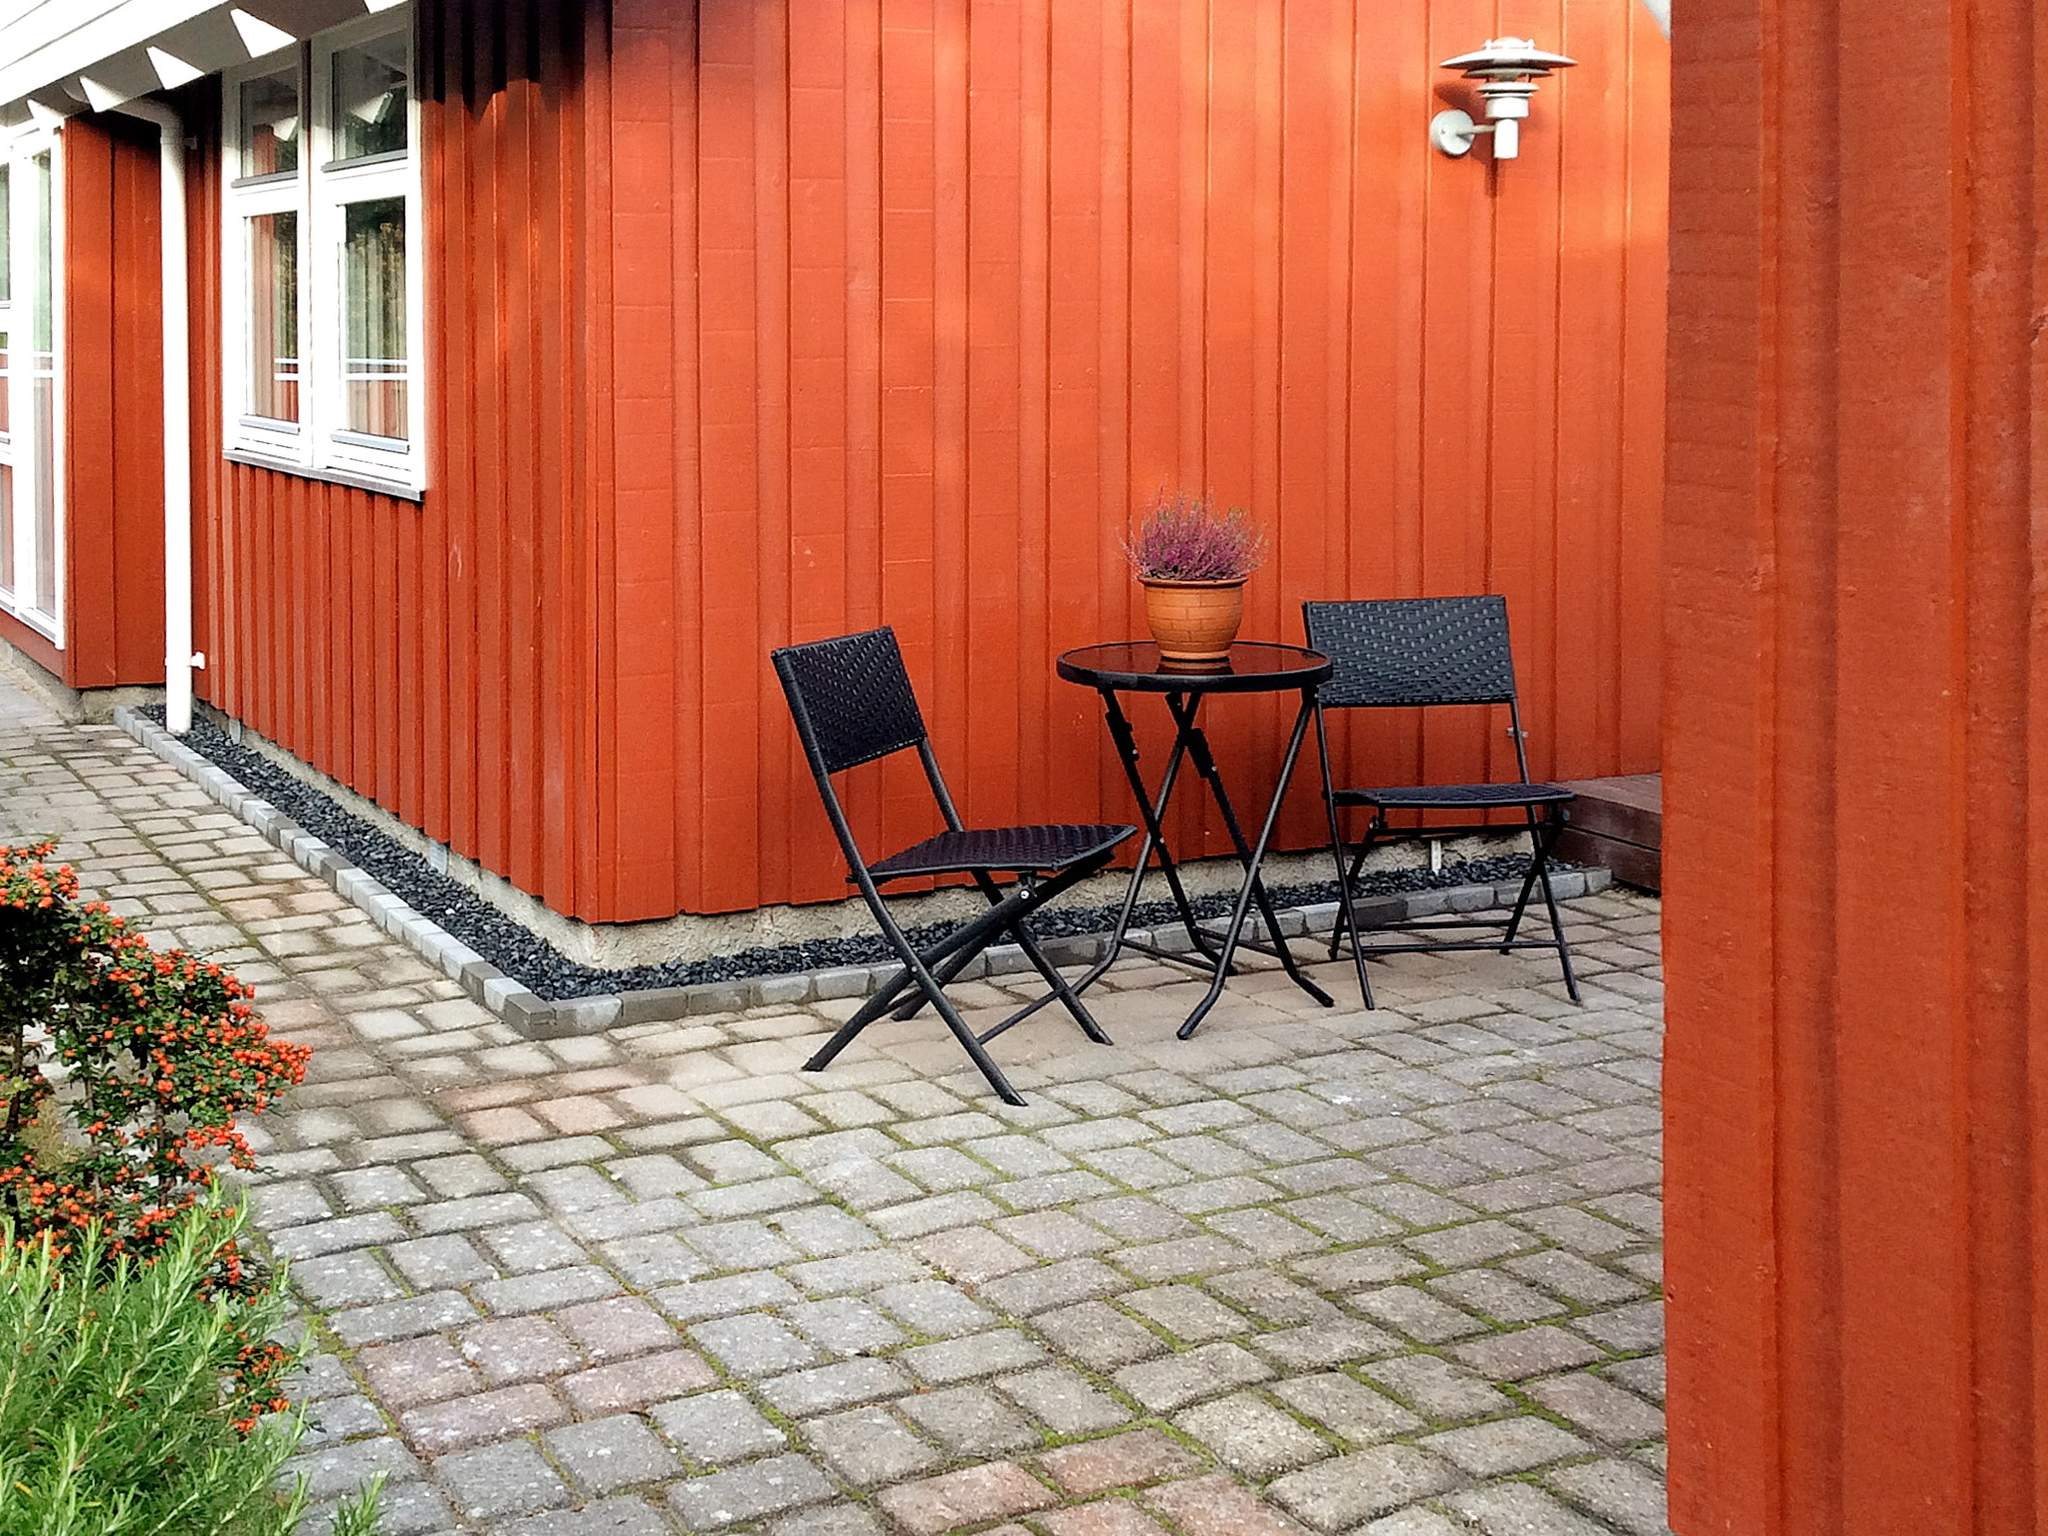 Ferienhaus Øster Hurup (83254), Øster Hurup, , Ostjütland, Dänemark, Bild 17